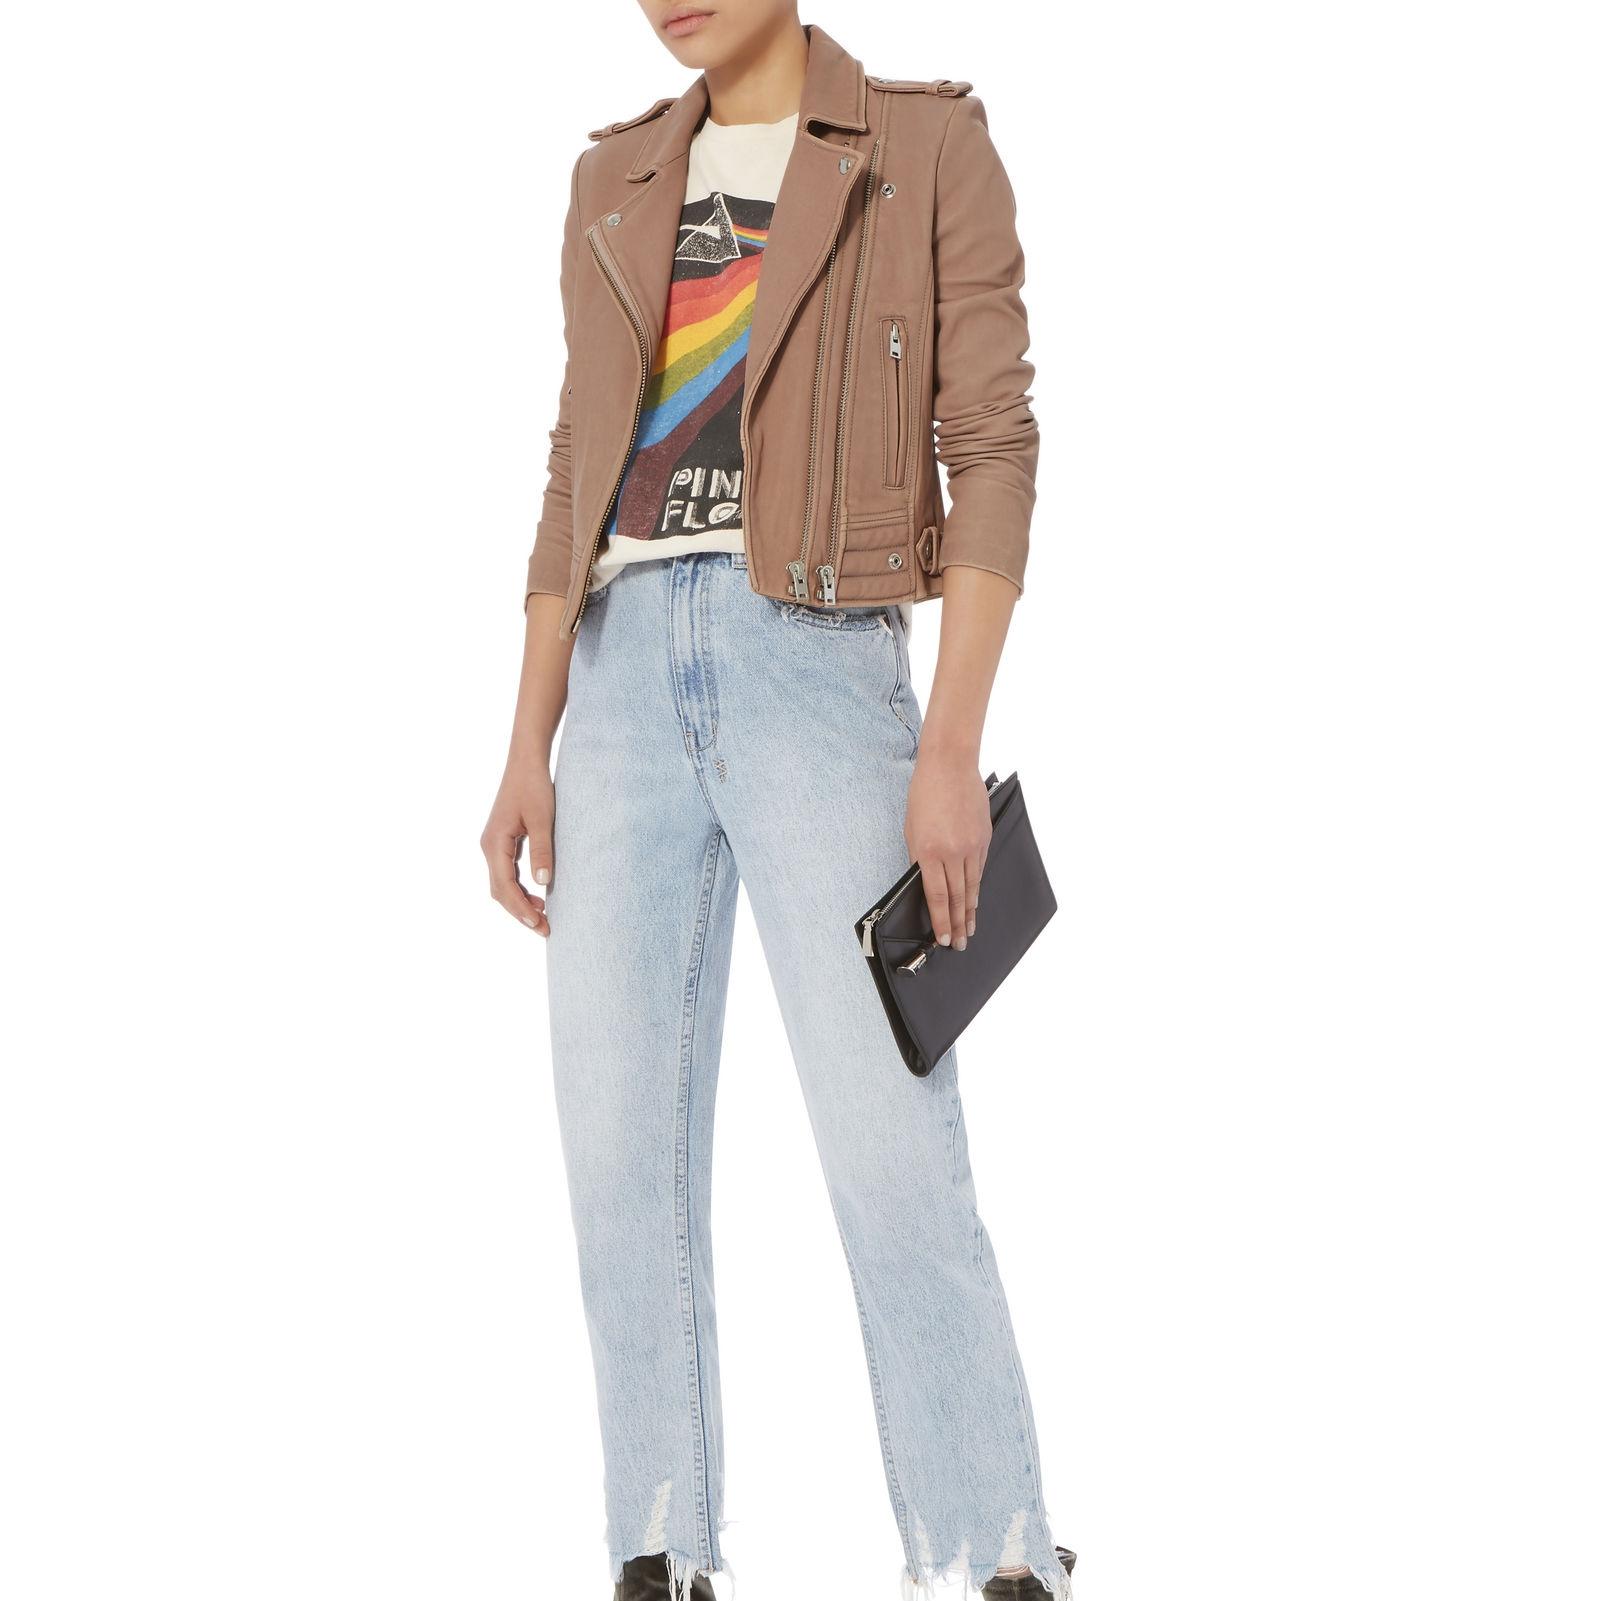 IRO @ Intermix Luiga Pink Cropped Leather Jkt $1661.52